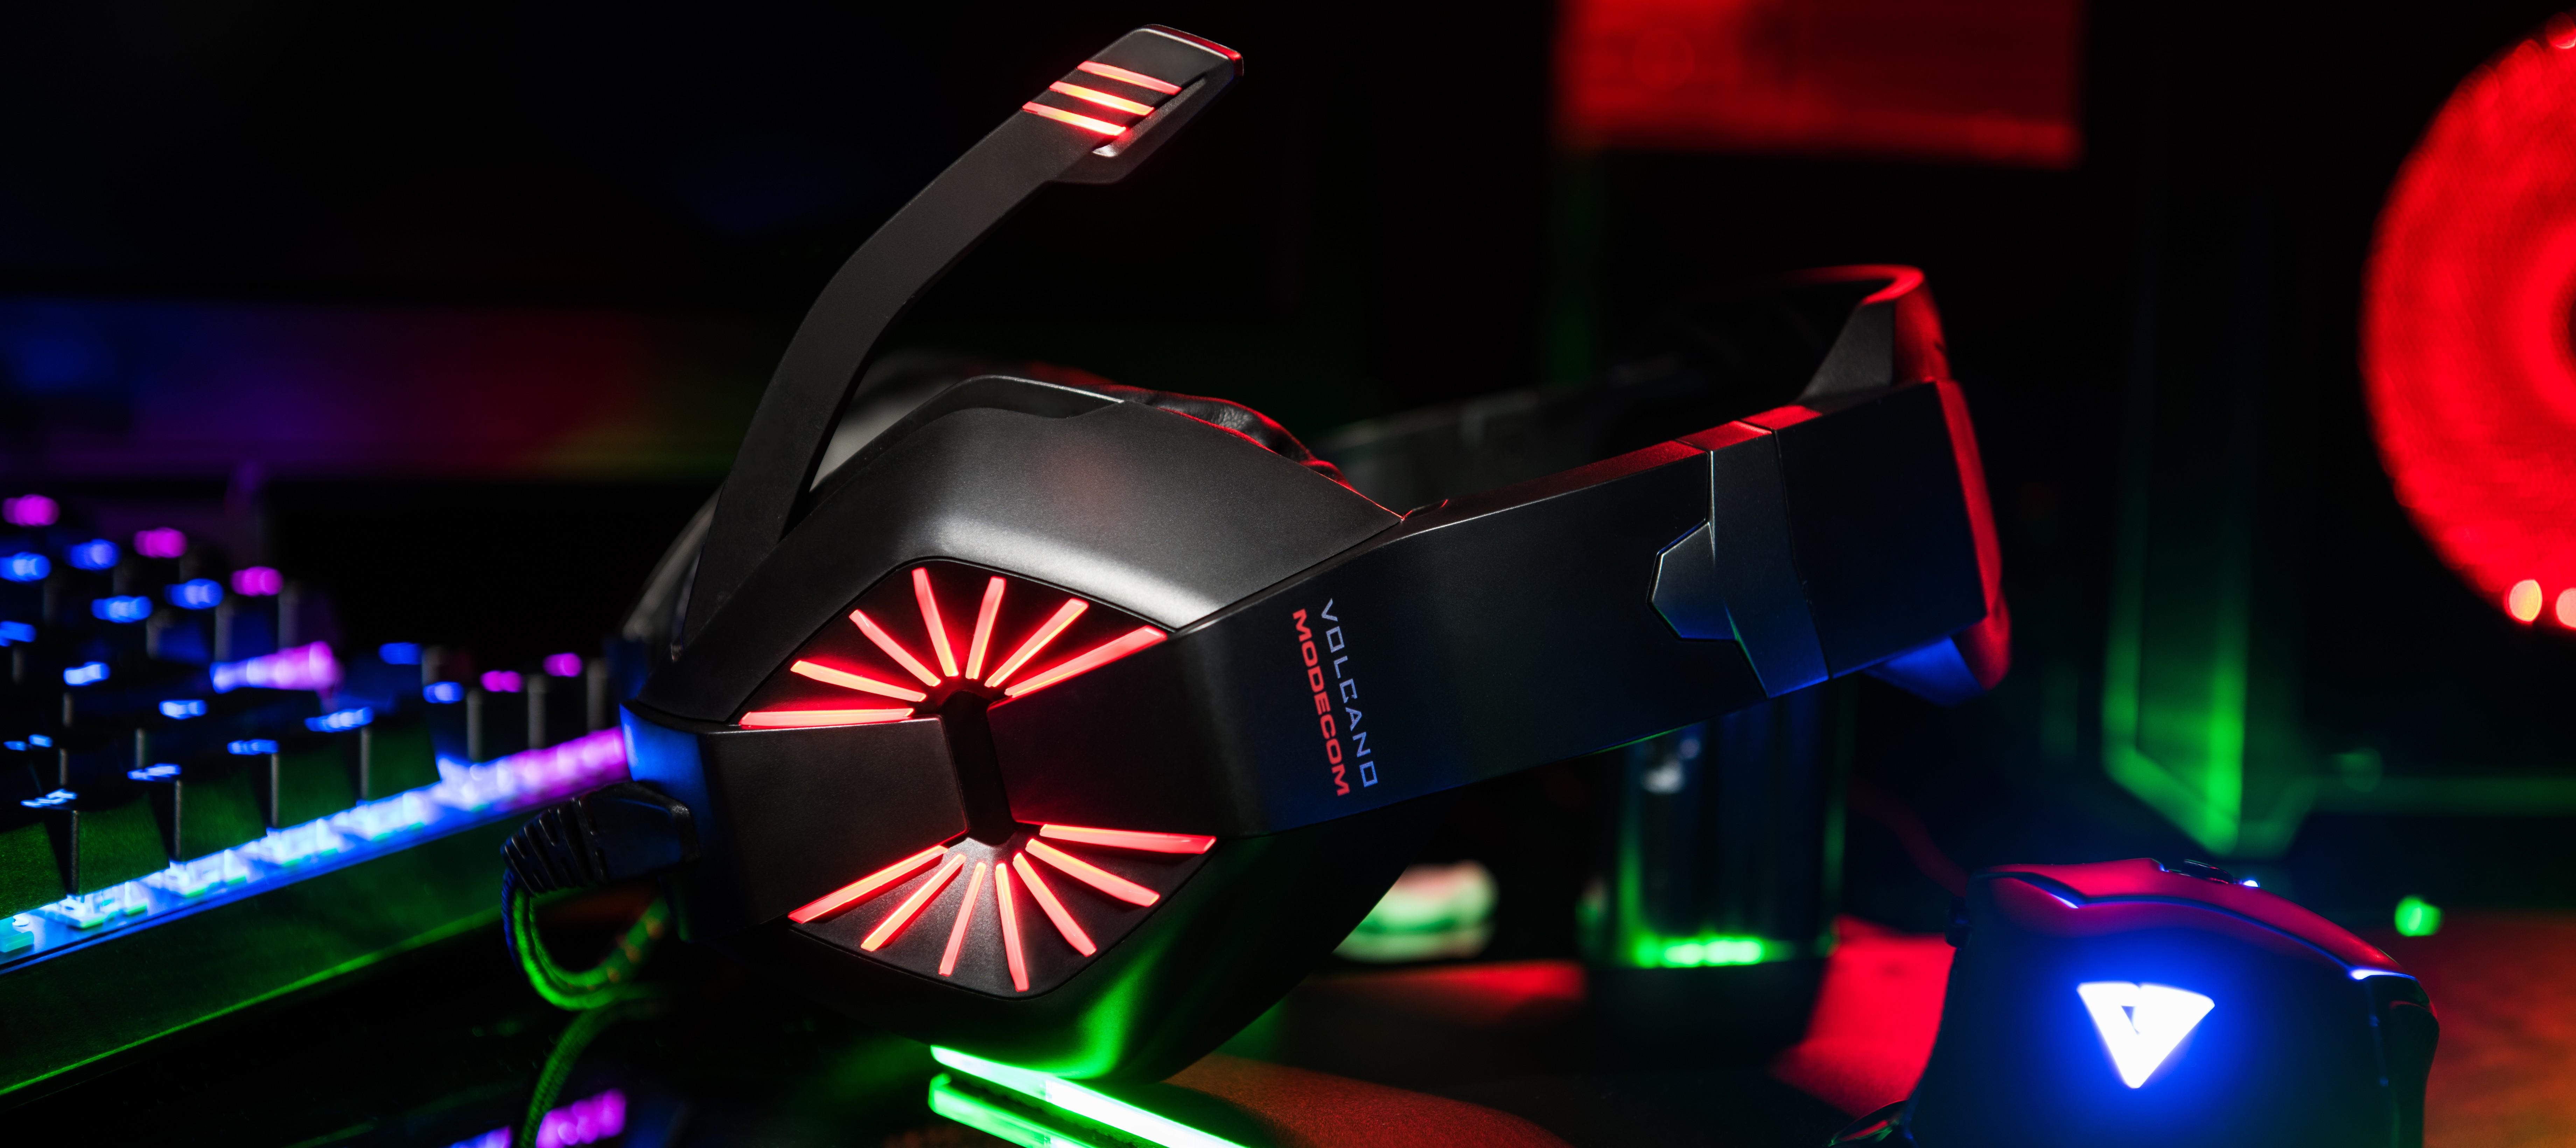 MODECOM VOLCANO MC-839 SWORD gaming headphones